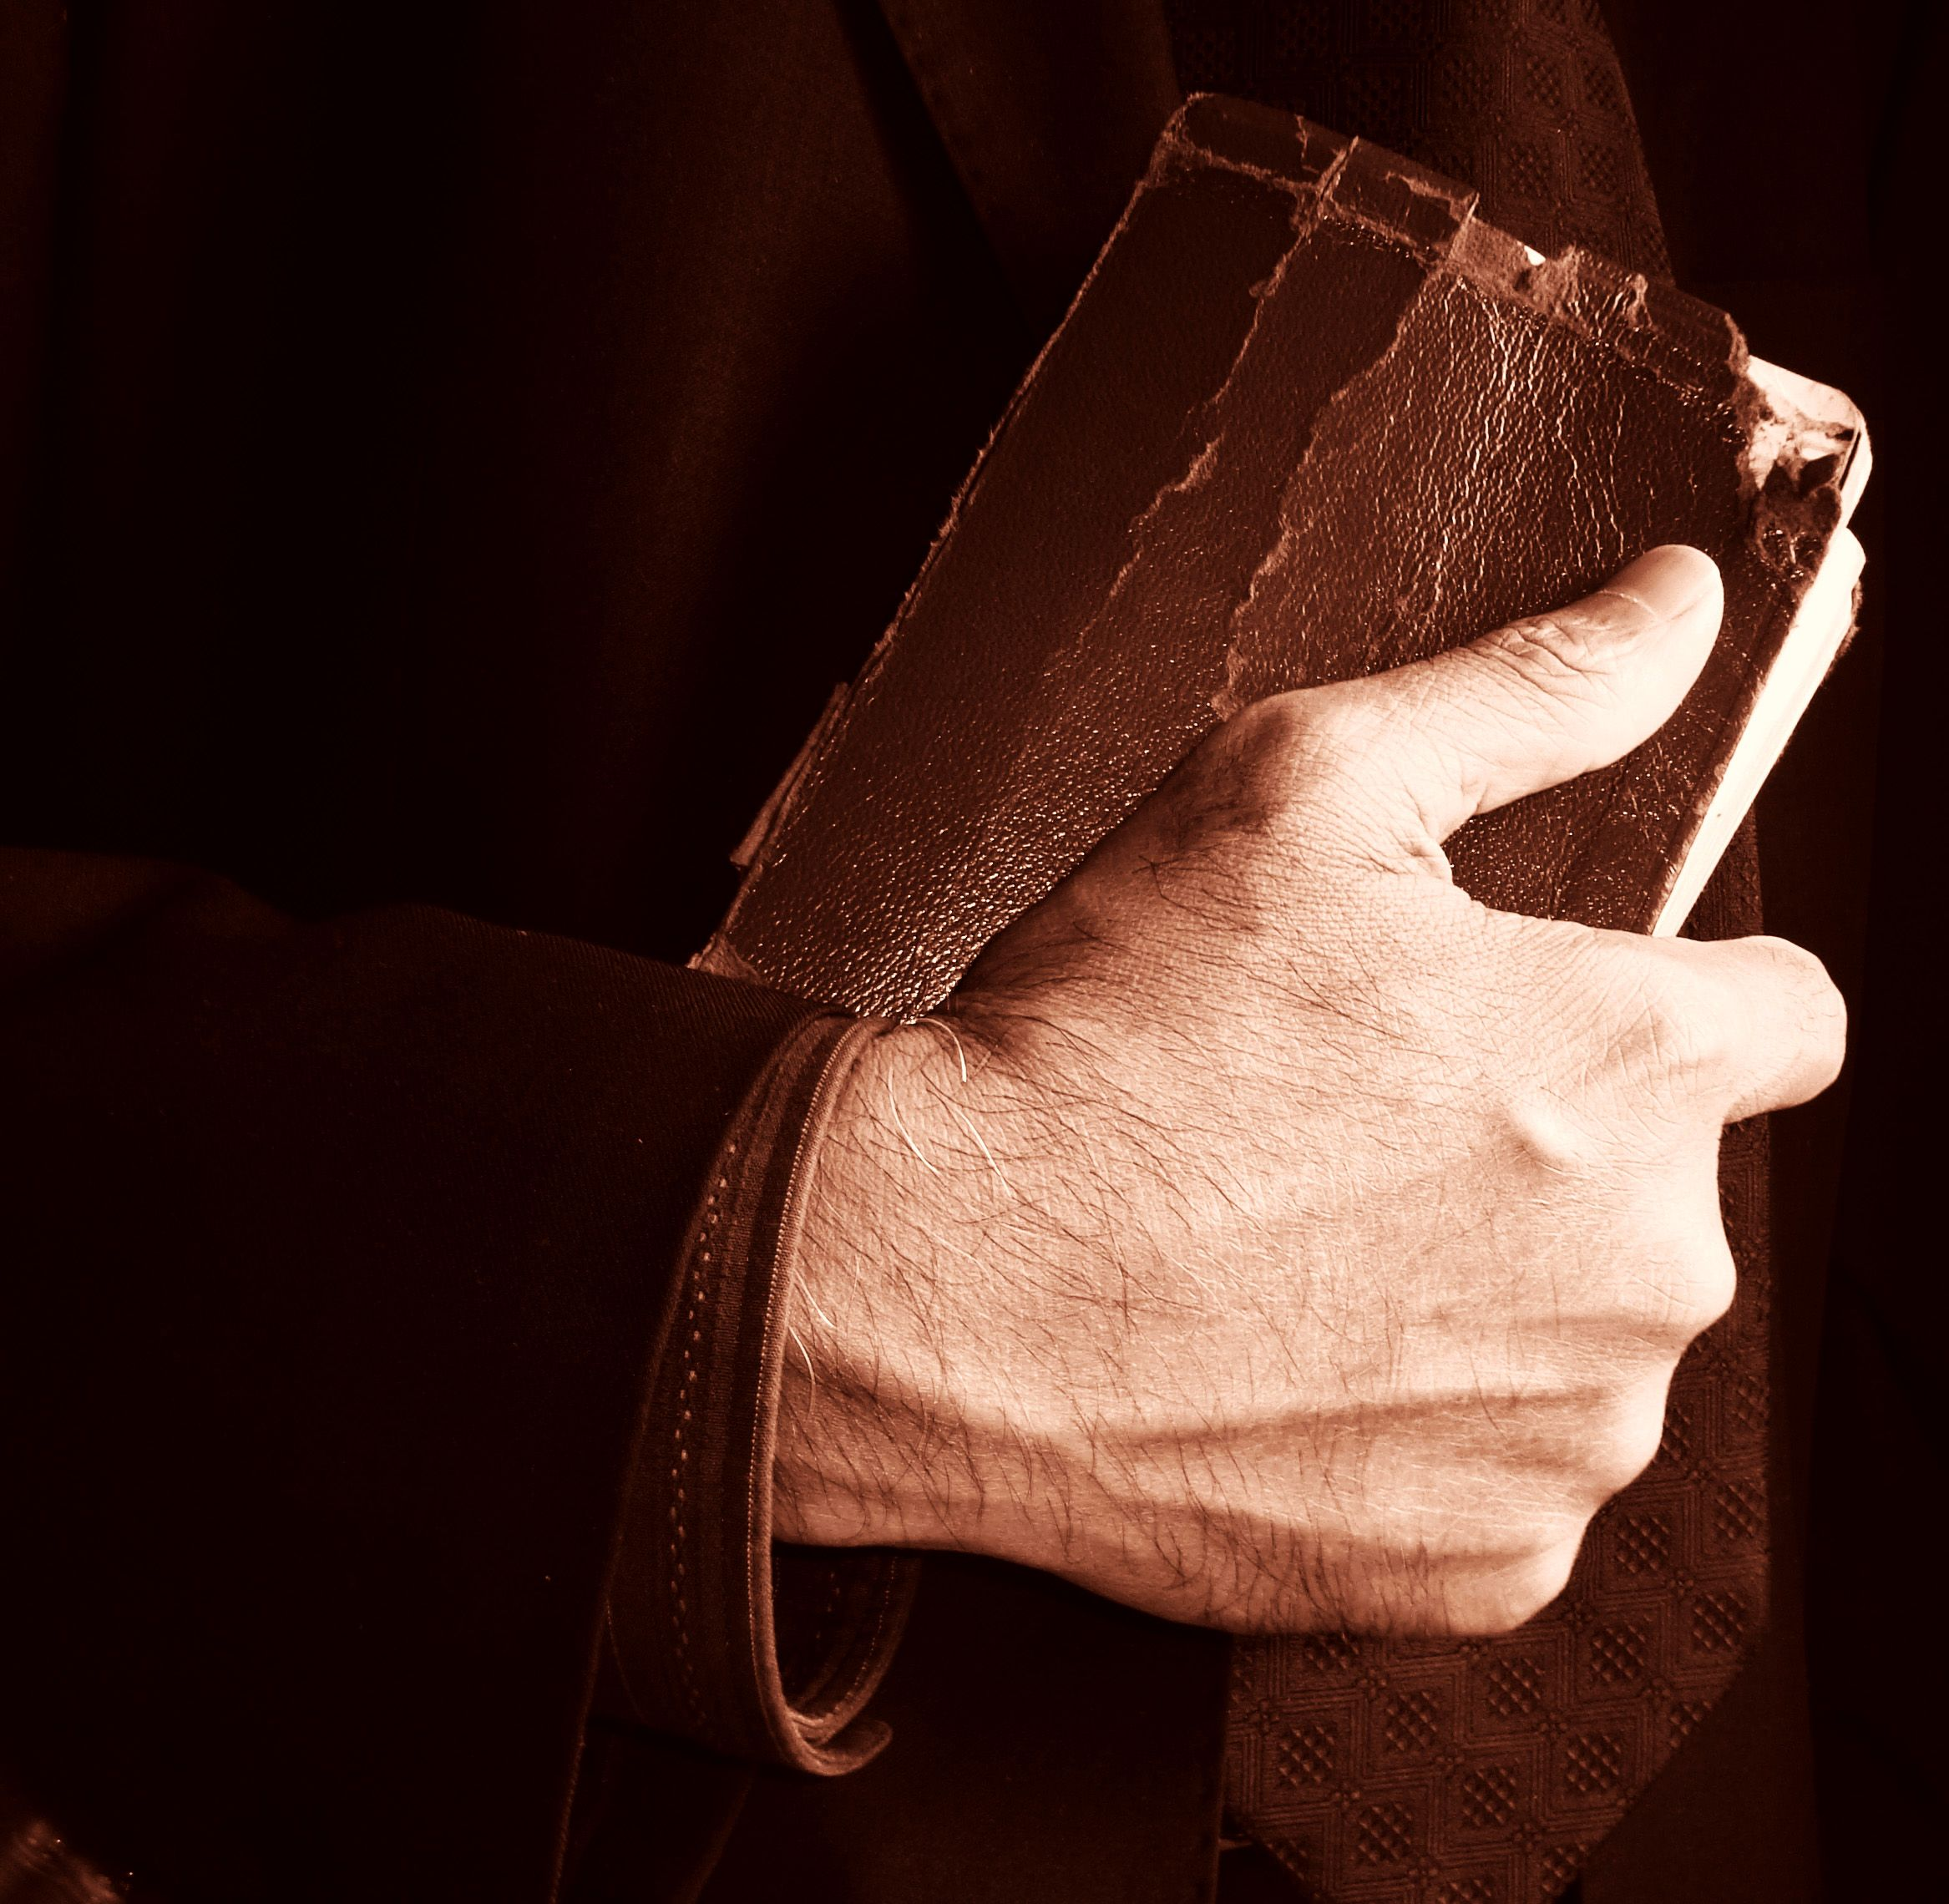 Keep a Strong Grip | More Than Useless Blog